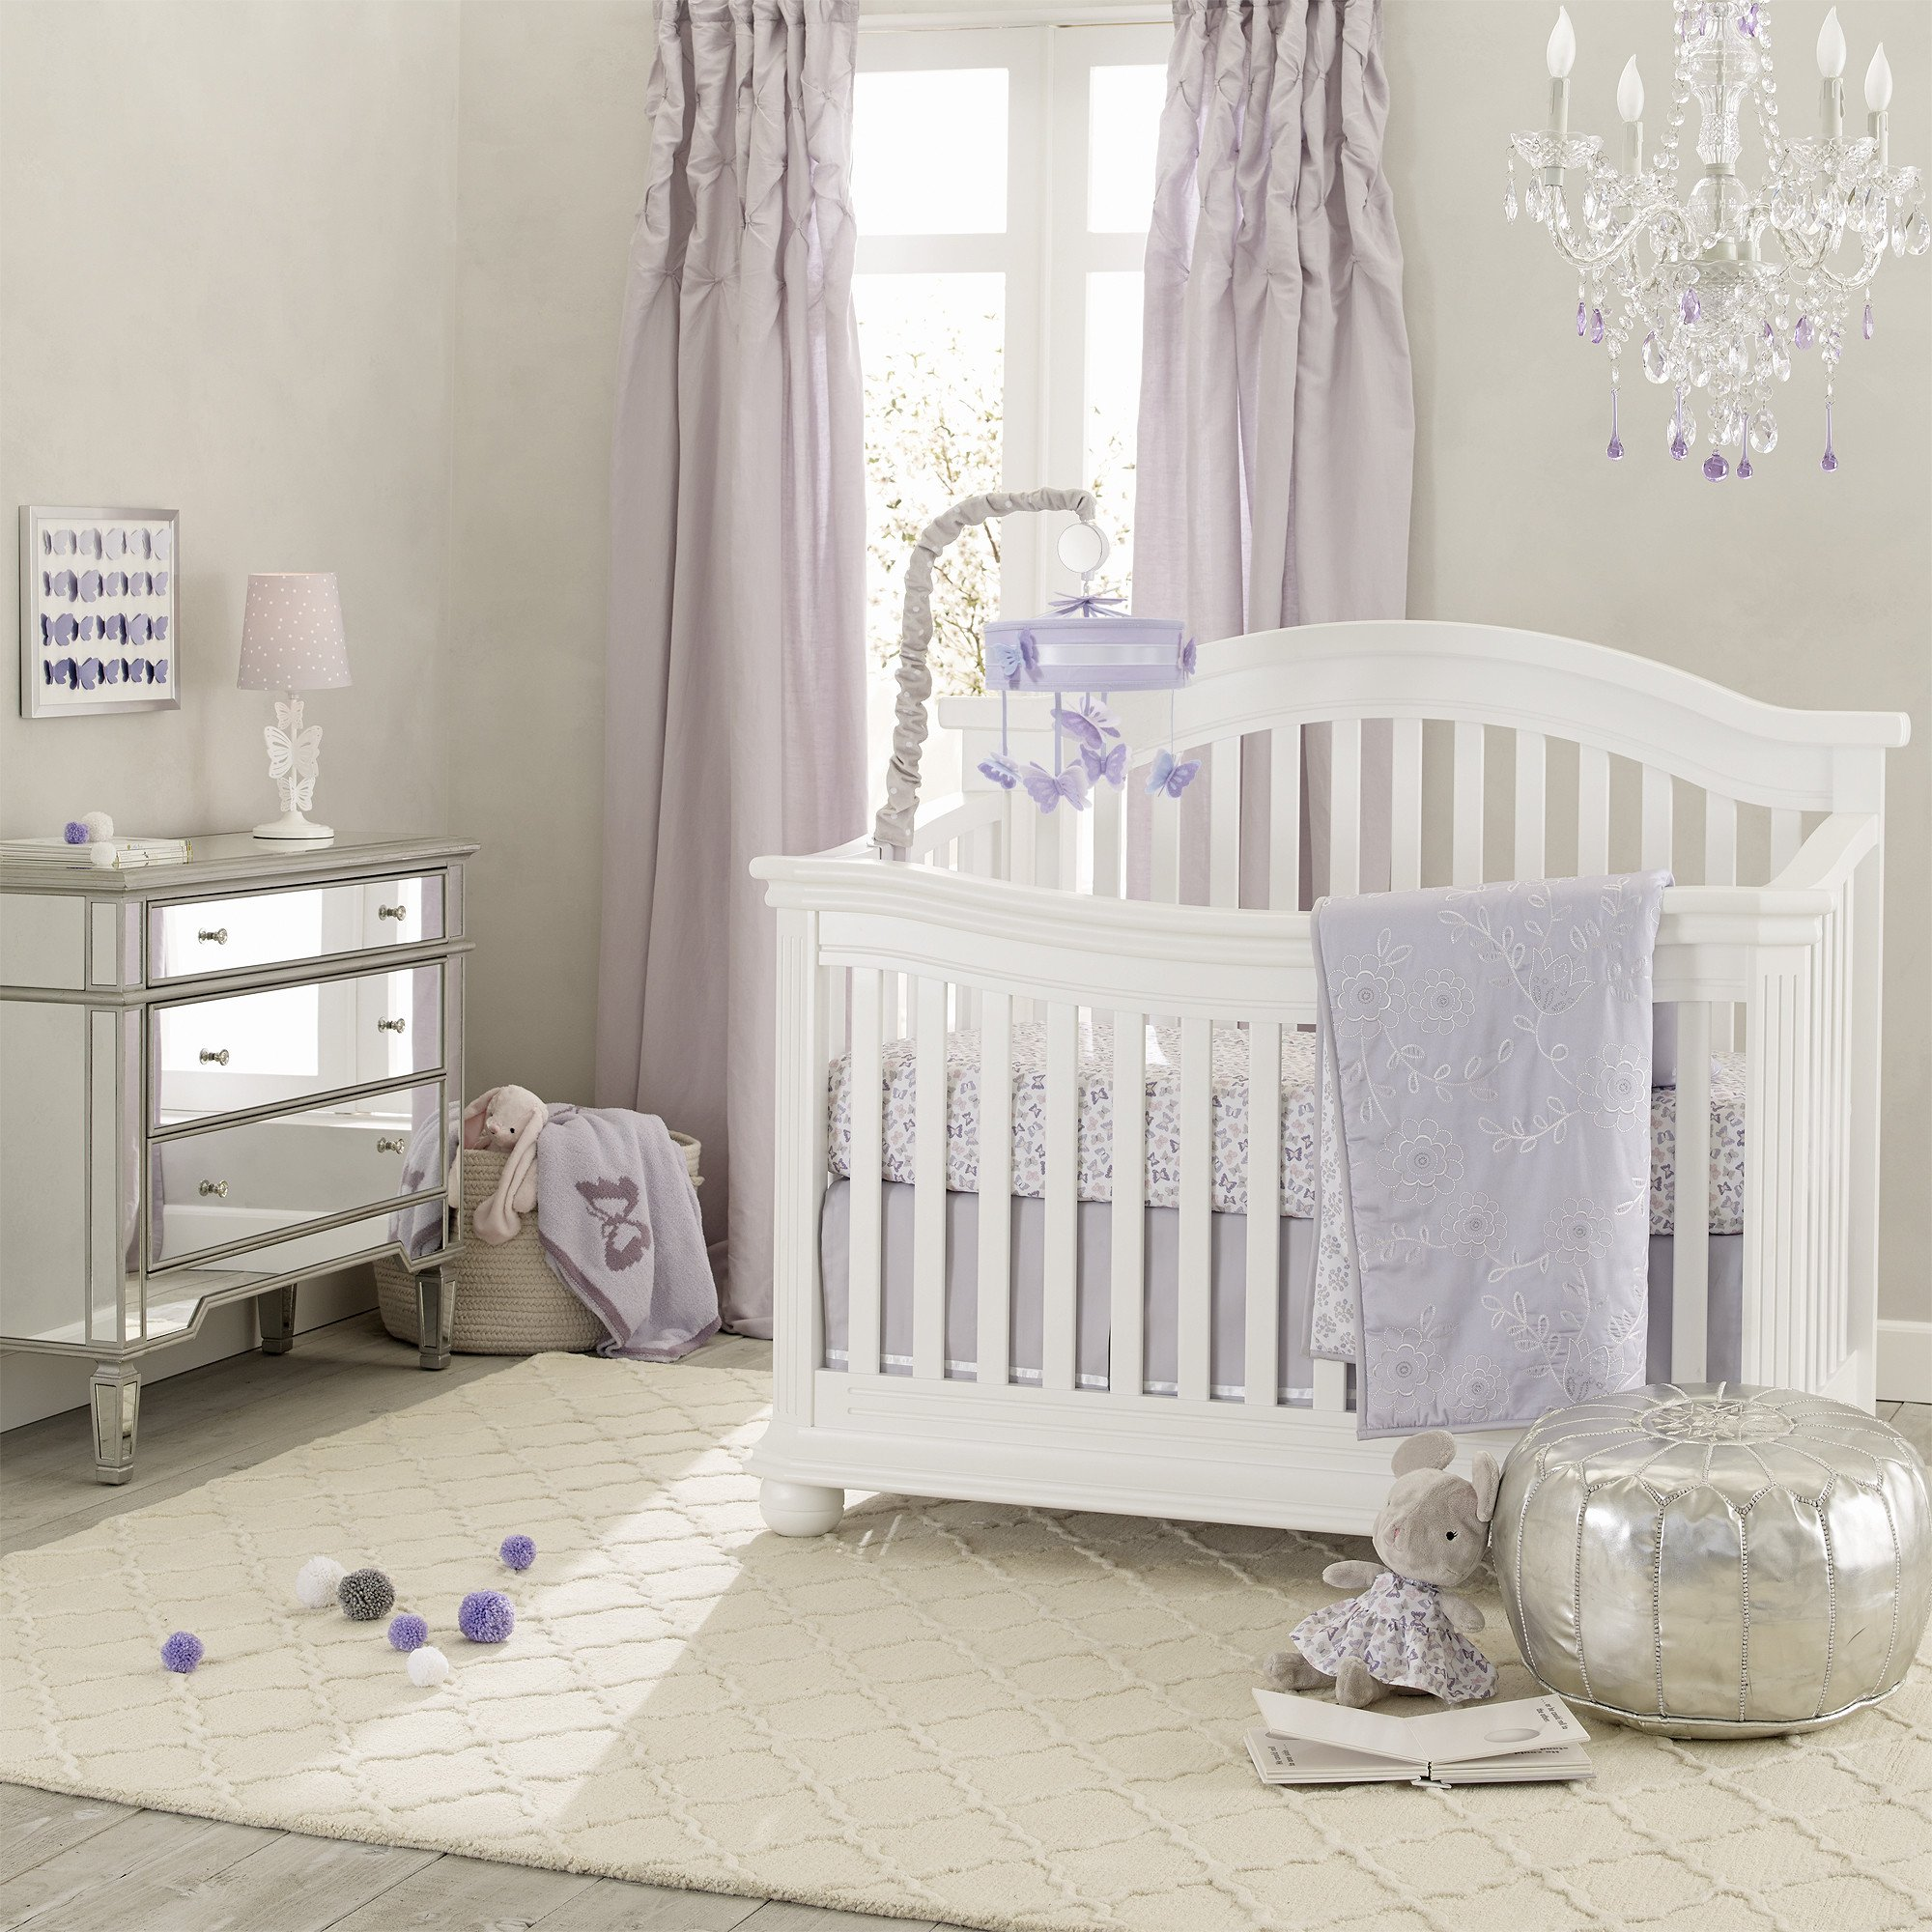 Signature French Lavender 4 Piece Crib Bedding Set Purple Crib